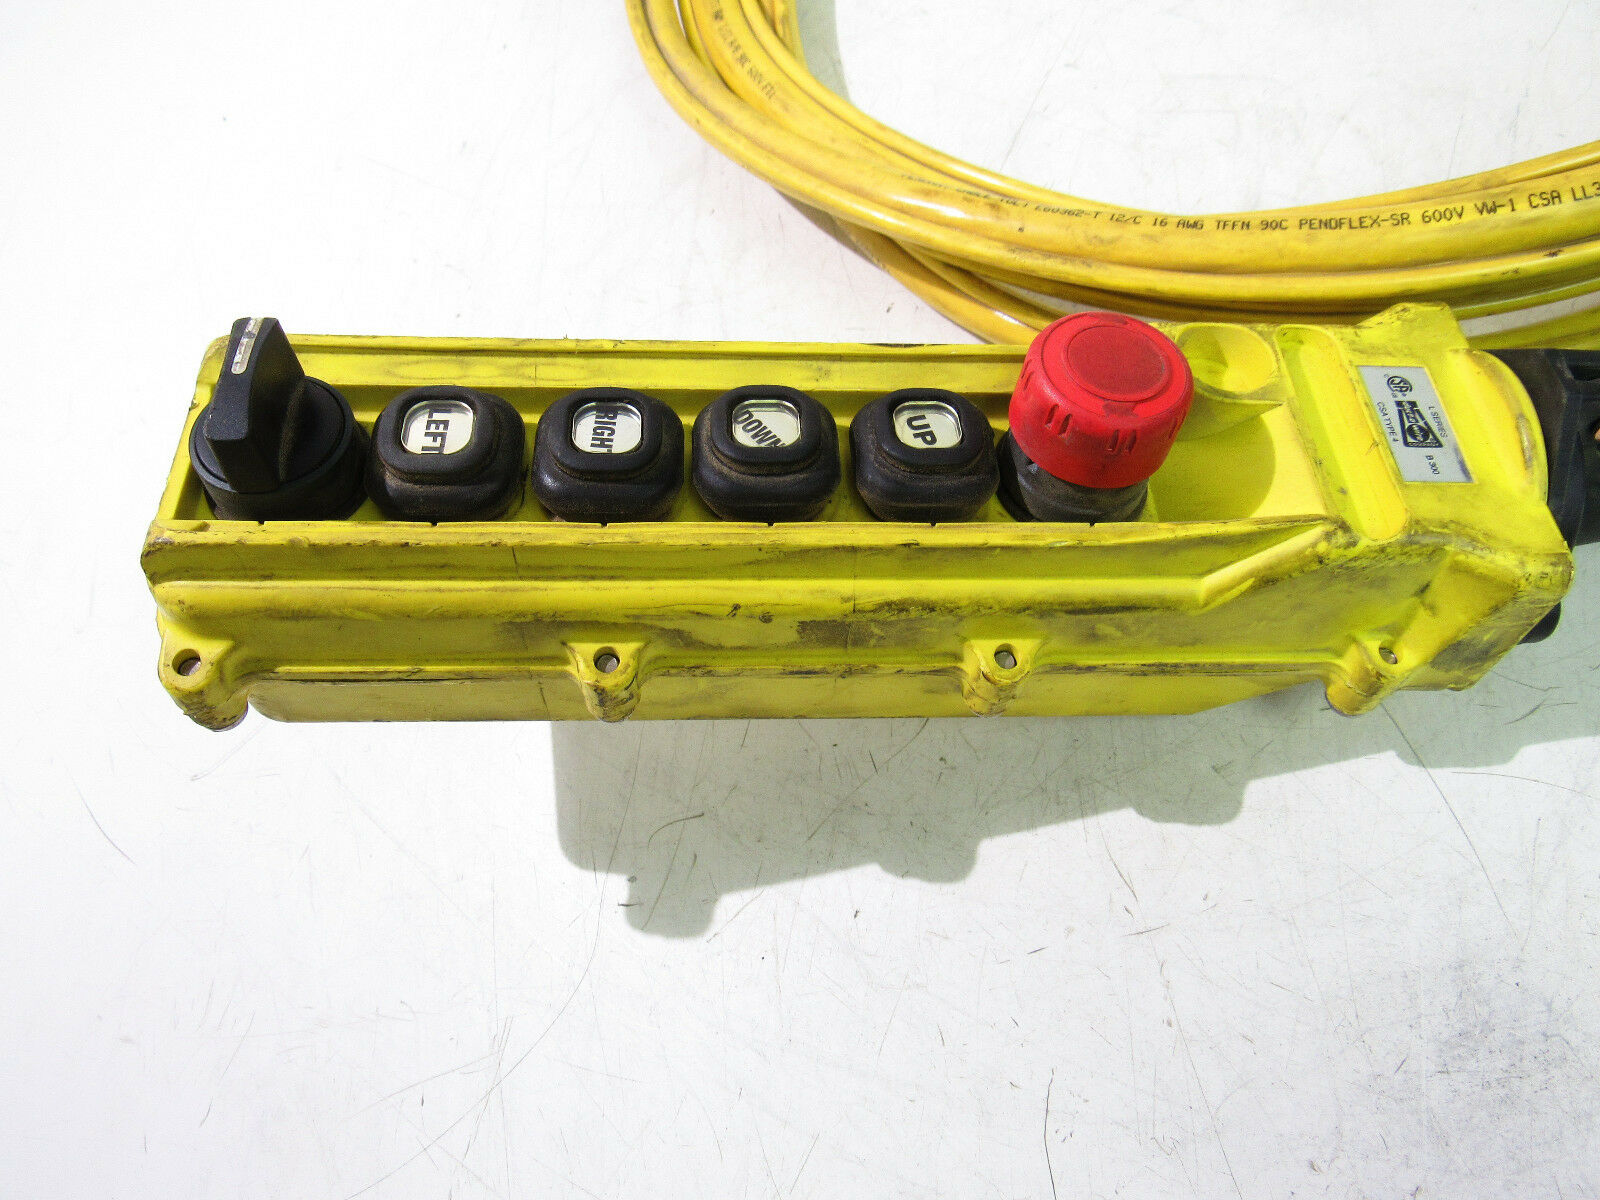 Duct O Wire Distributors - Turcolea.com Magnetek Sbp Wiring Diagram Pendant on demag wiring diagram, norton wiring diagram, msi wiring diagram, clark wiring diagram, toshiba wiring diagram, mettler toledo wiring diagram, yaskawa wiring diagram, abb wiring diagram, apc wiring diagram, viking wiring diagram, a.o. smith wiring diagram, smc wiring diagram, sullair wiring diagram, matrix wiring diagram, taylor wiring diagram, ingersoll rand wiring diagram, little giant wiring diagram, johnson controls wiring diagram, cooper wiring diagram, panasonic wiring diagram,